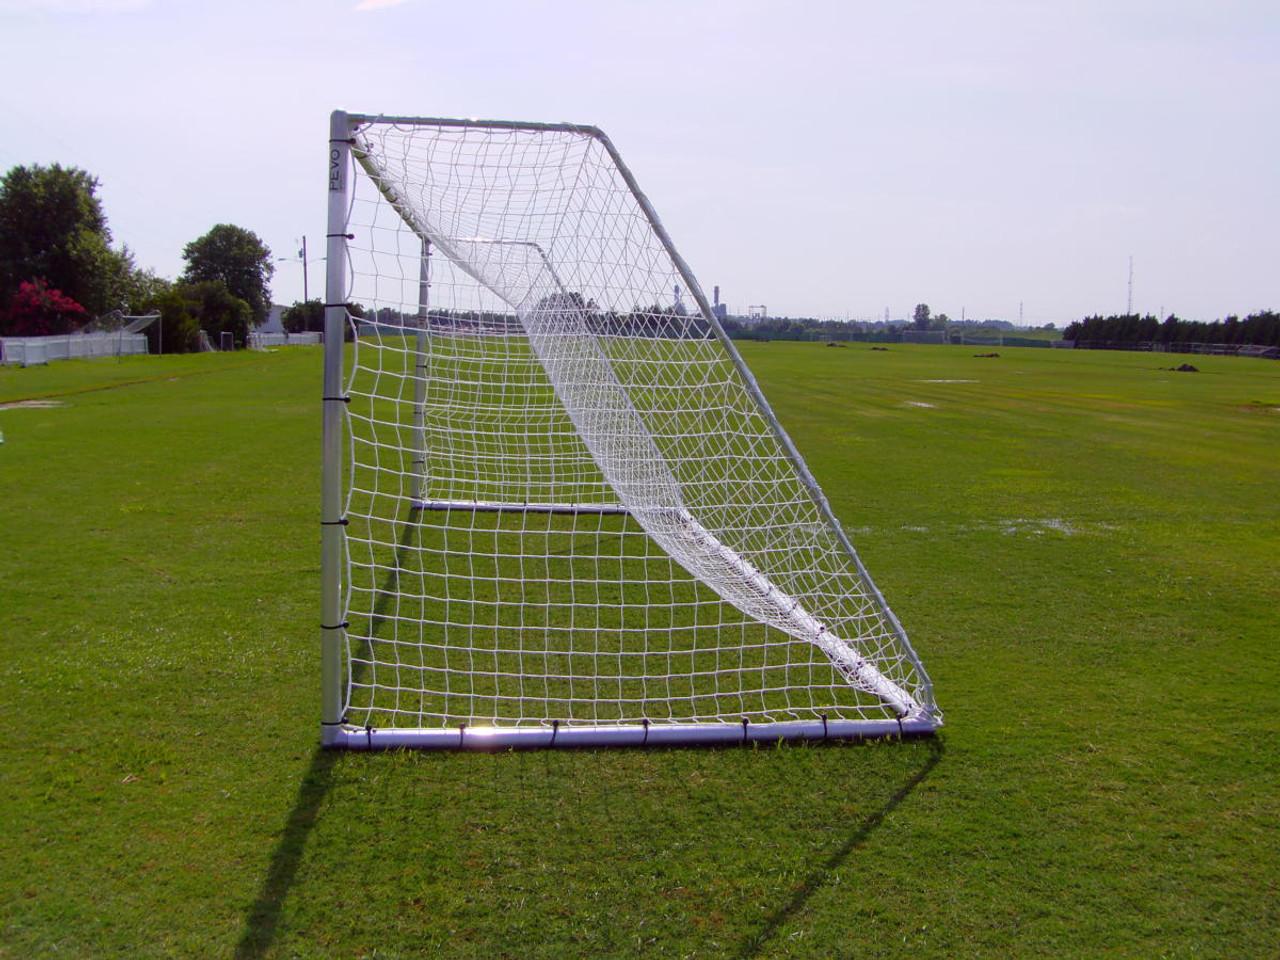 Pevo Soccer goals 8' x 24_2